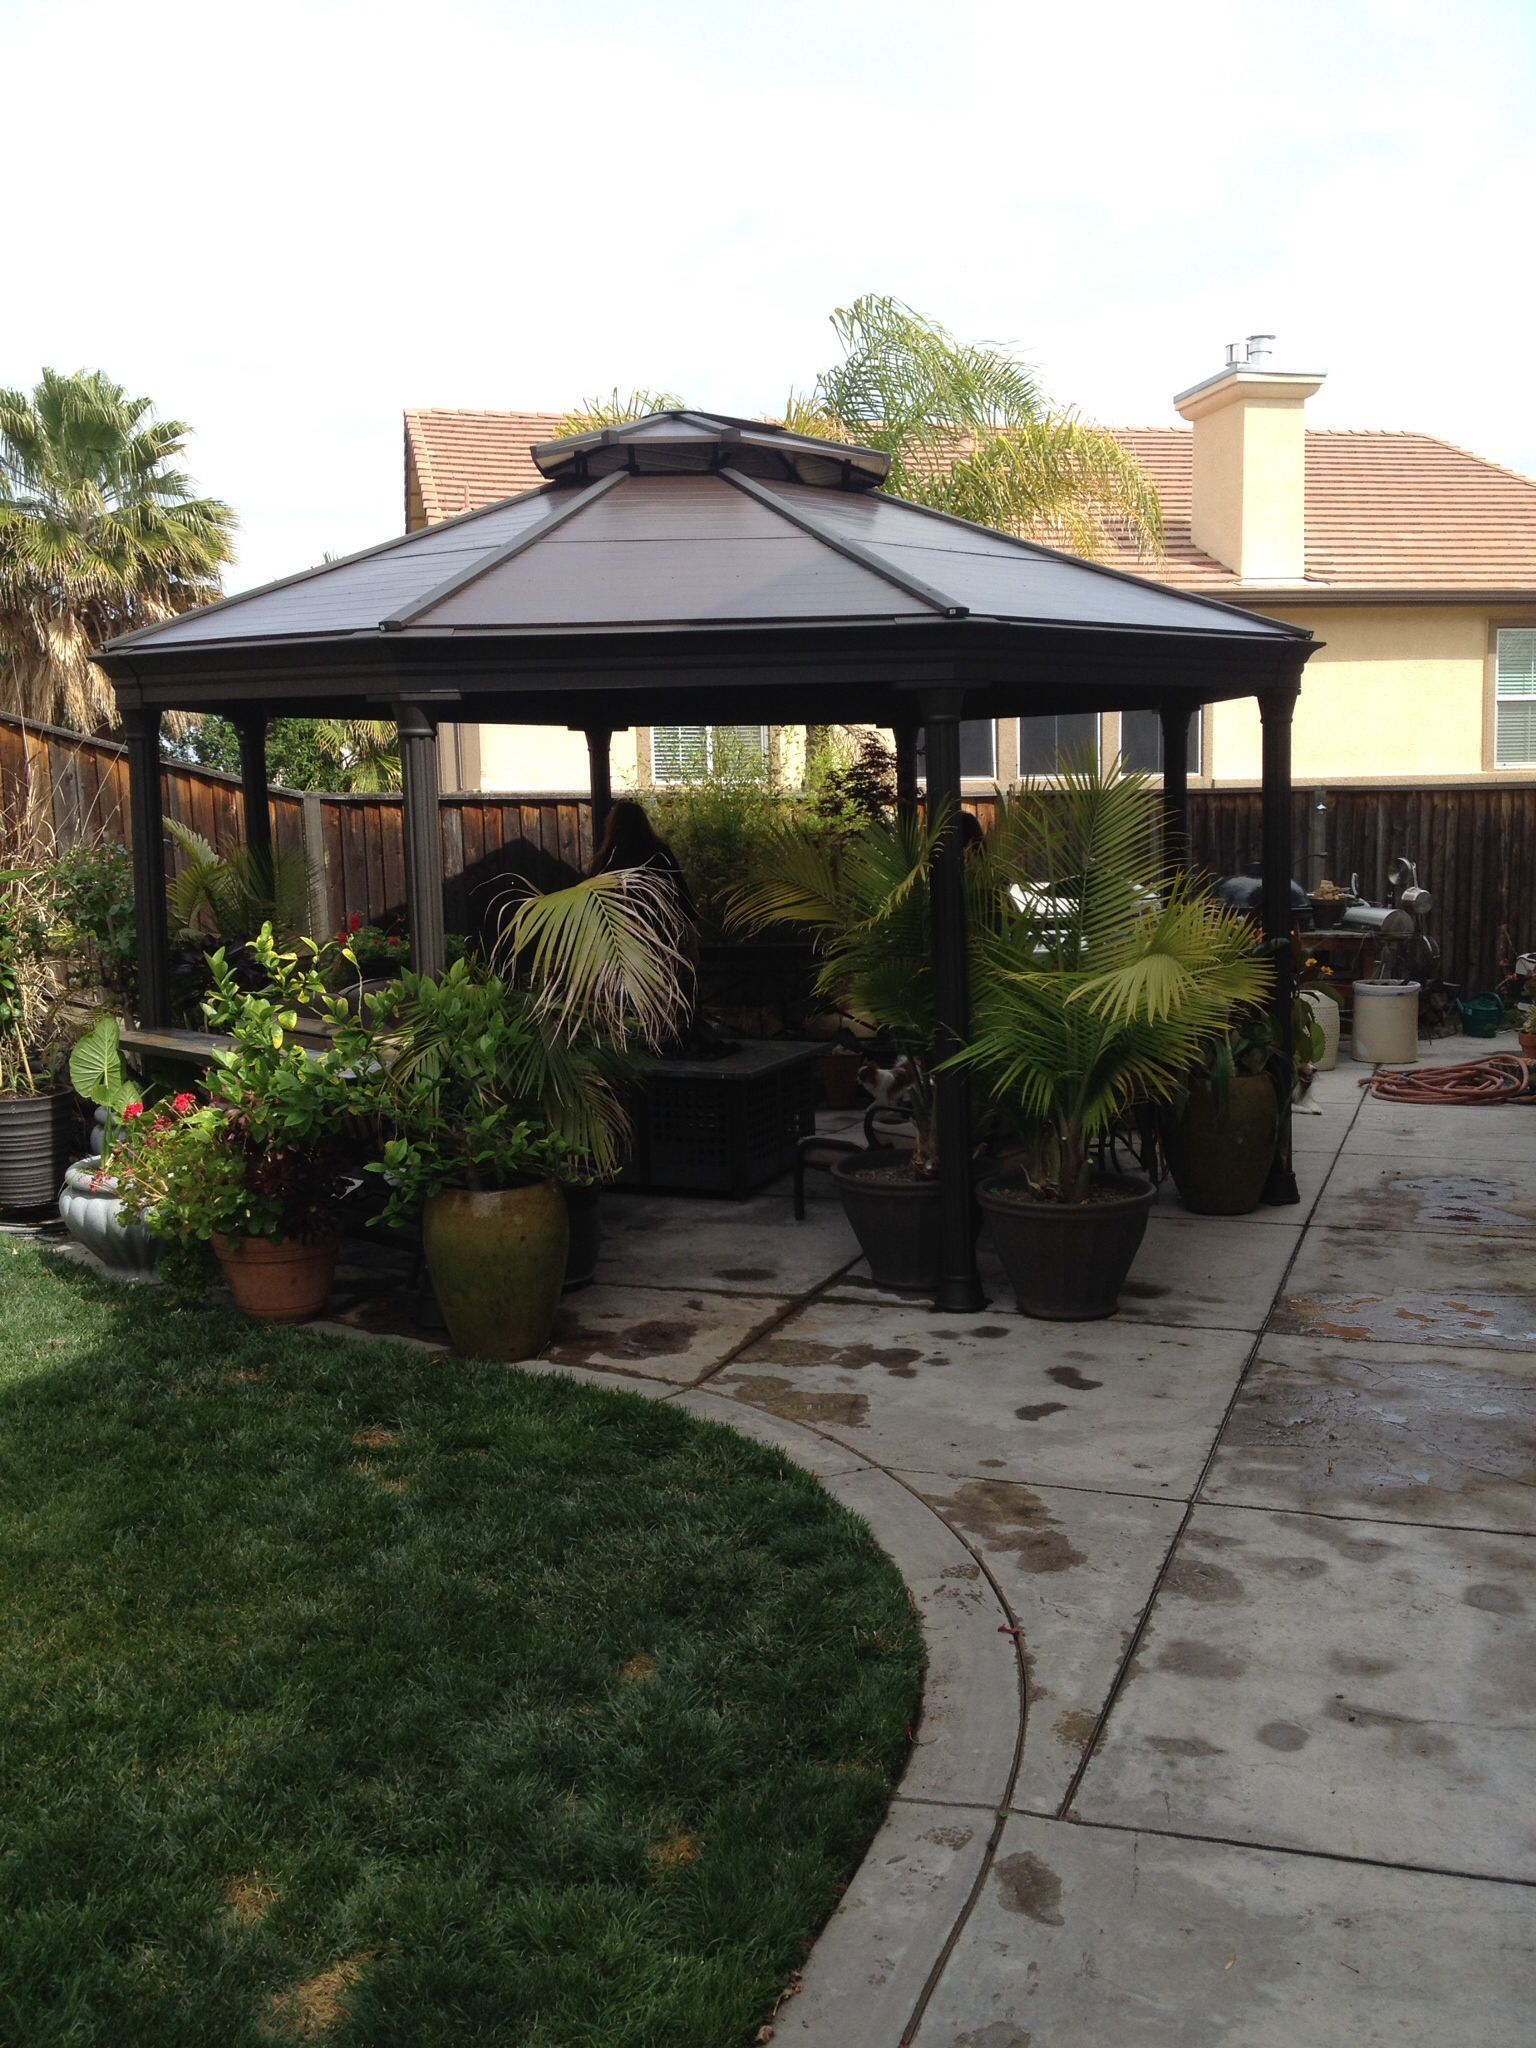 The Costco Gazebo In My Backyard In 2020 Small Garden Gazebo